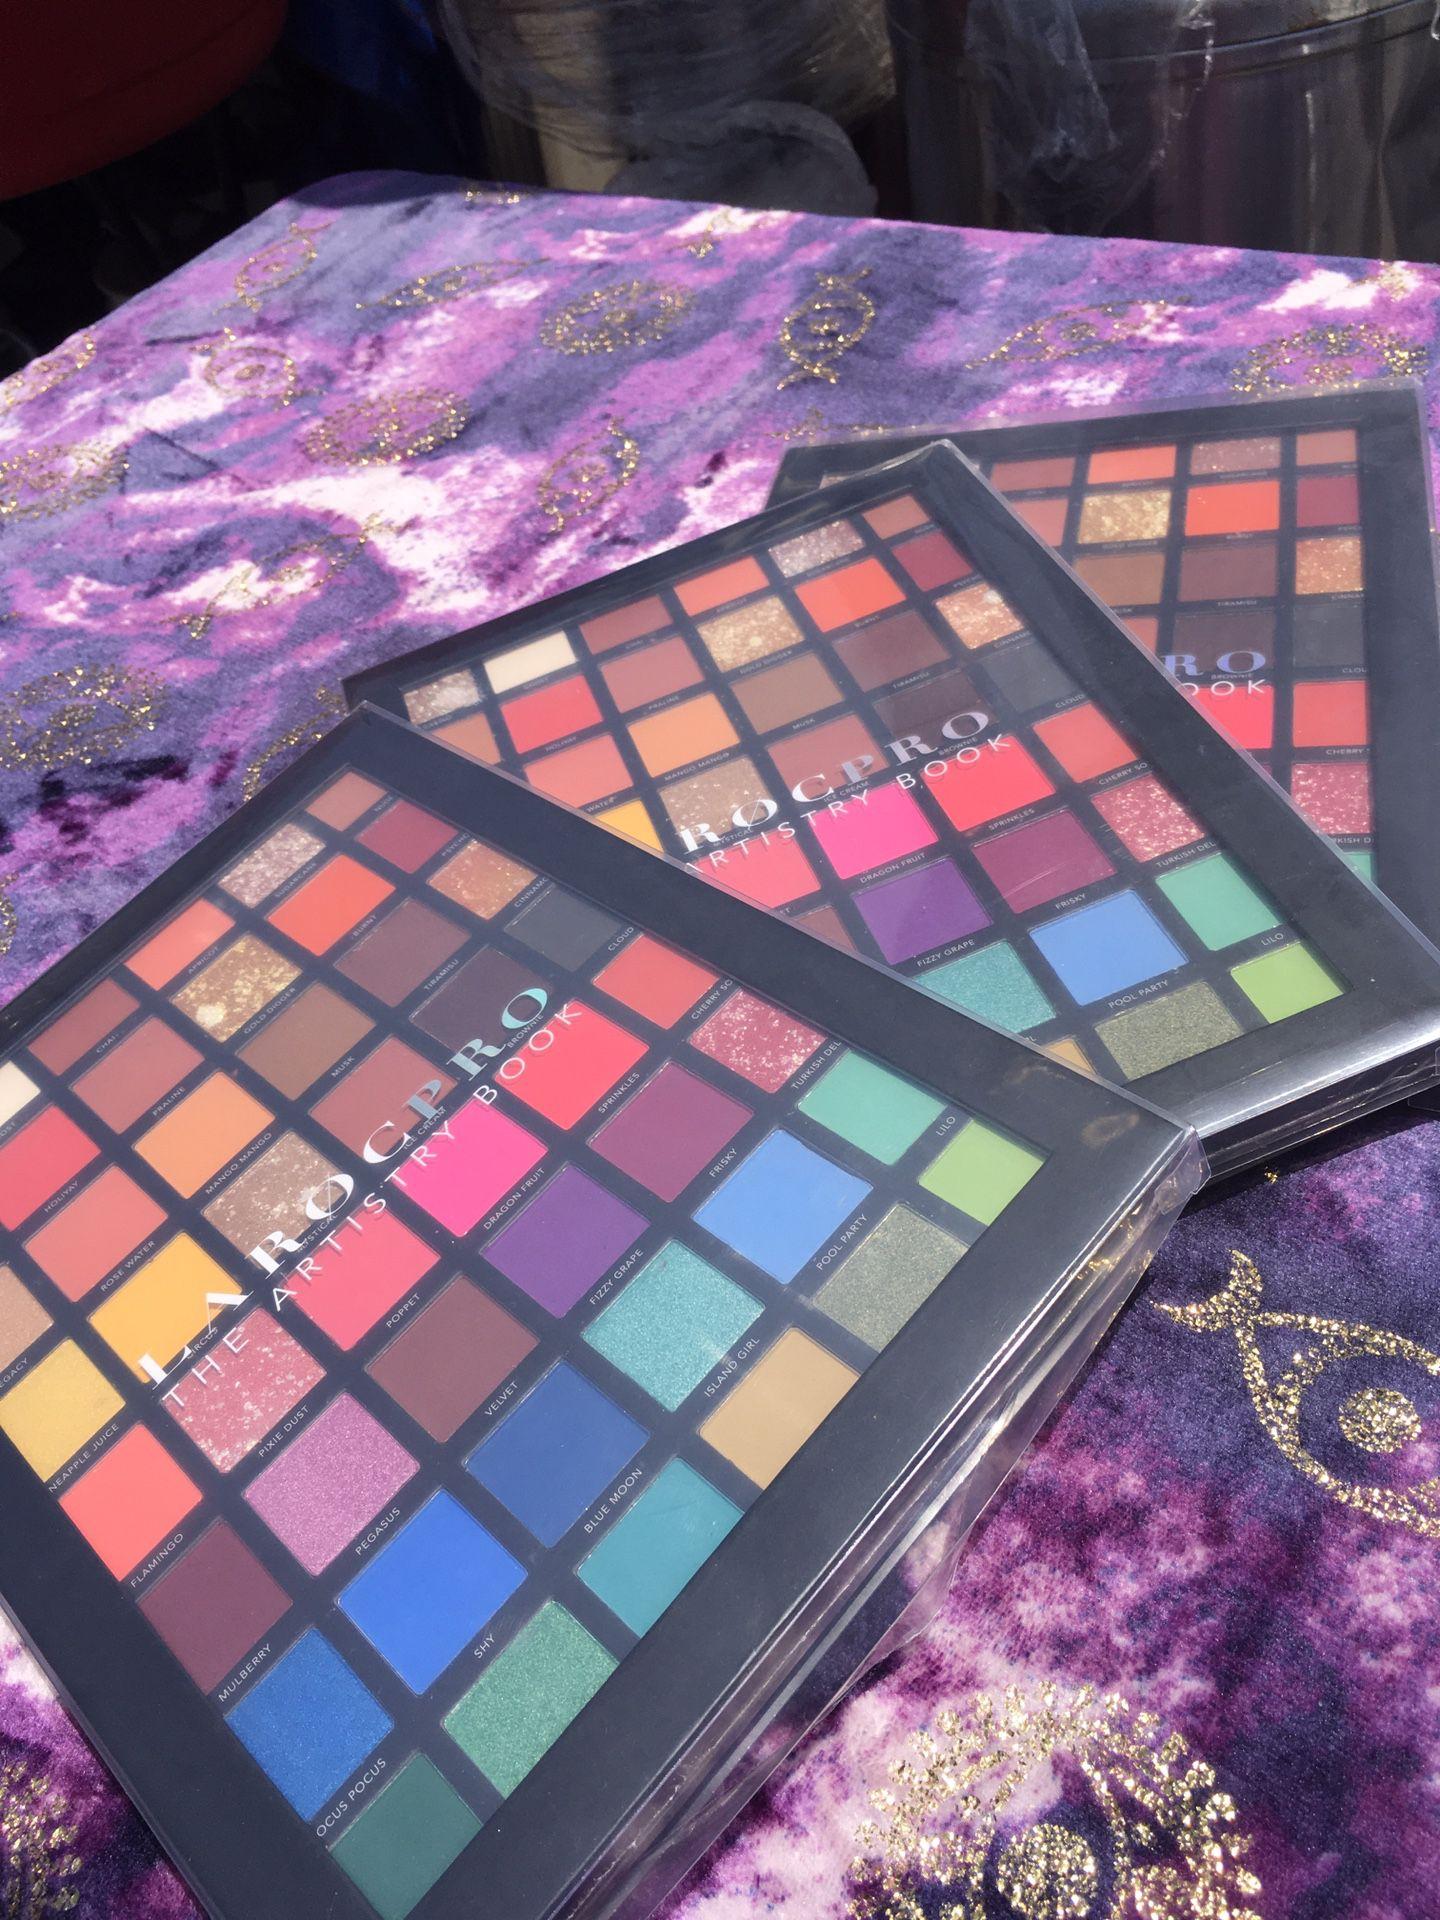 LaRoc Pro Artistry Eyeshadow palette